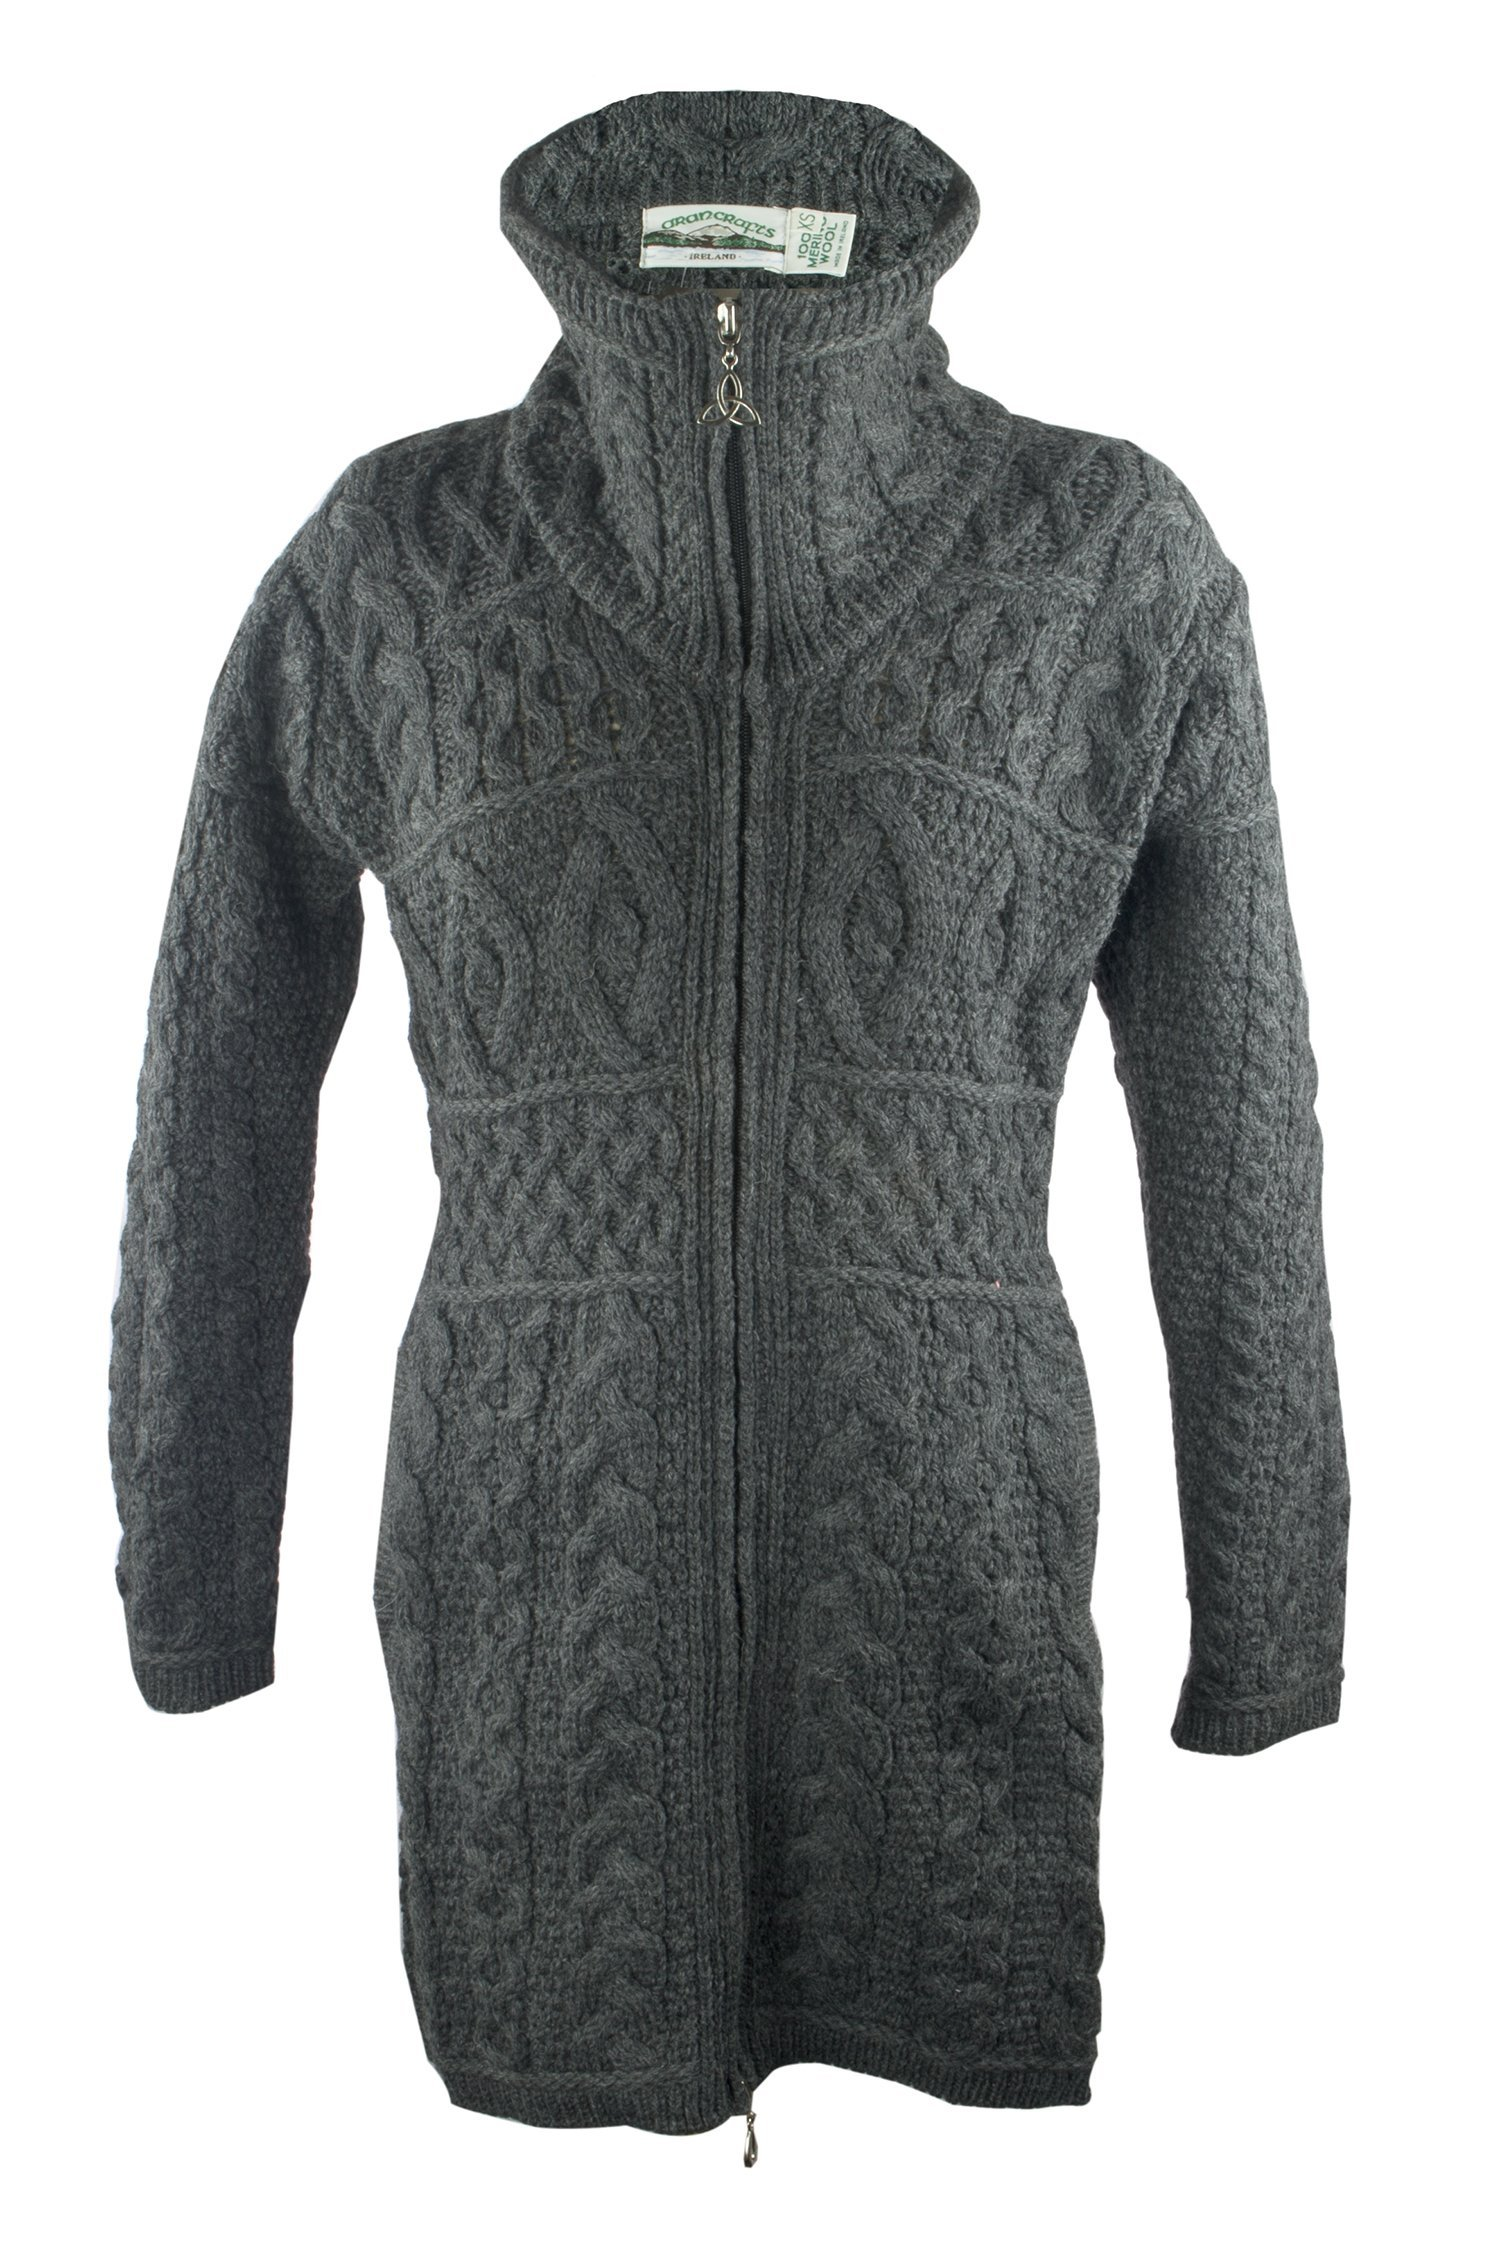 100% Irish Merino Wool Double Collar Aran Knit Coat, Charcoal, Extra Large